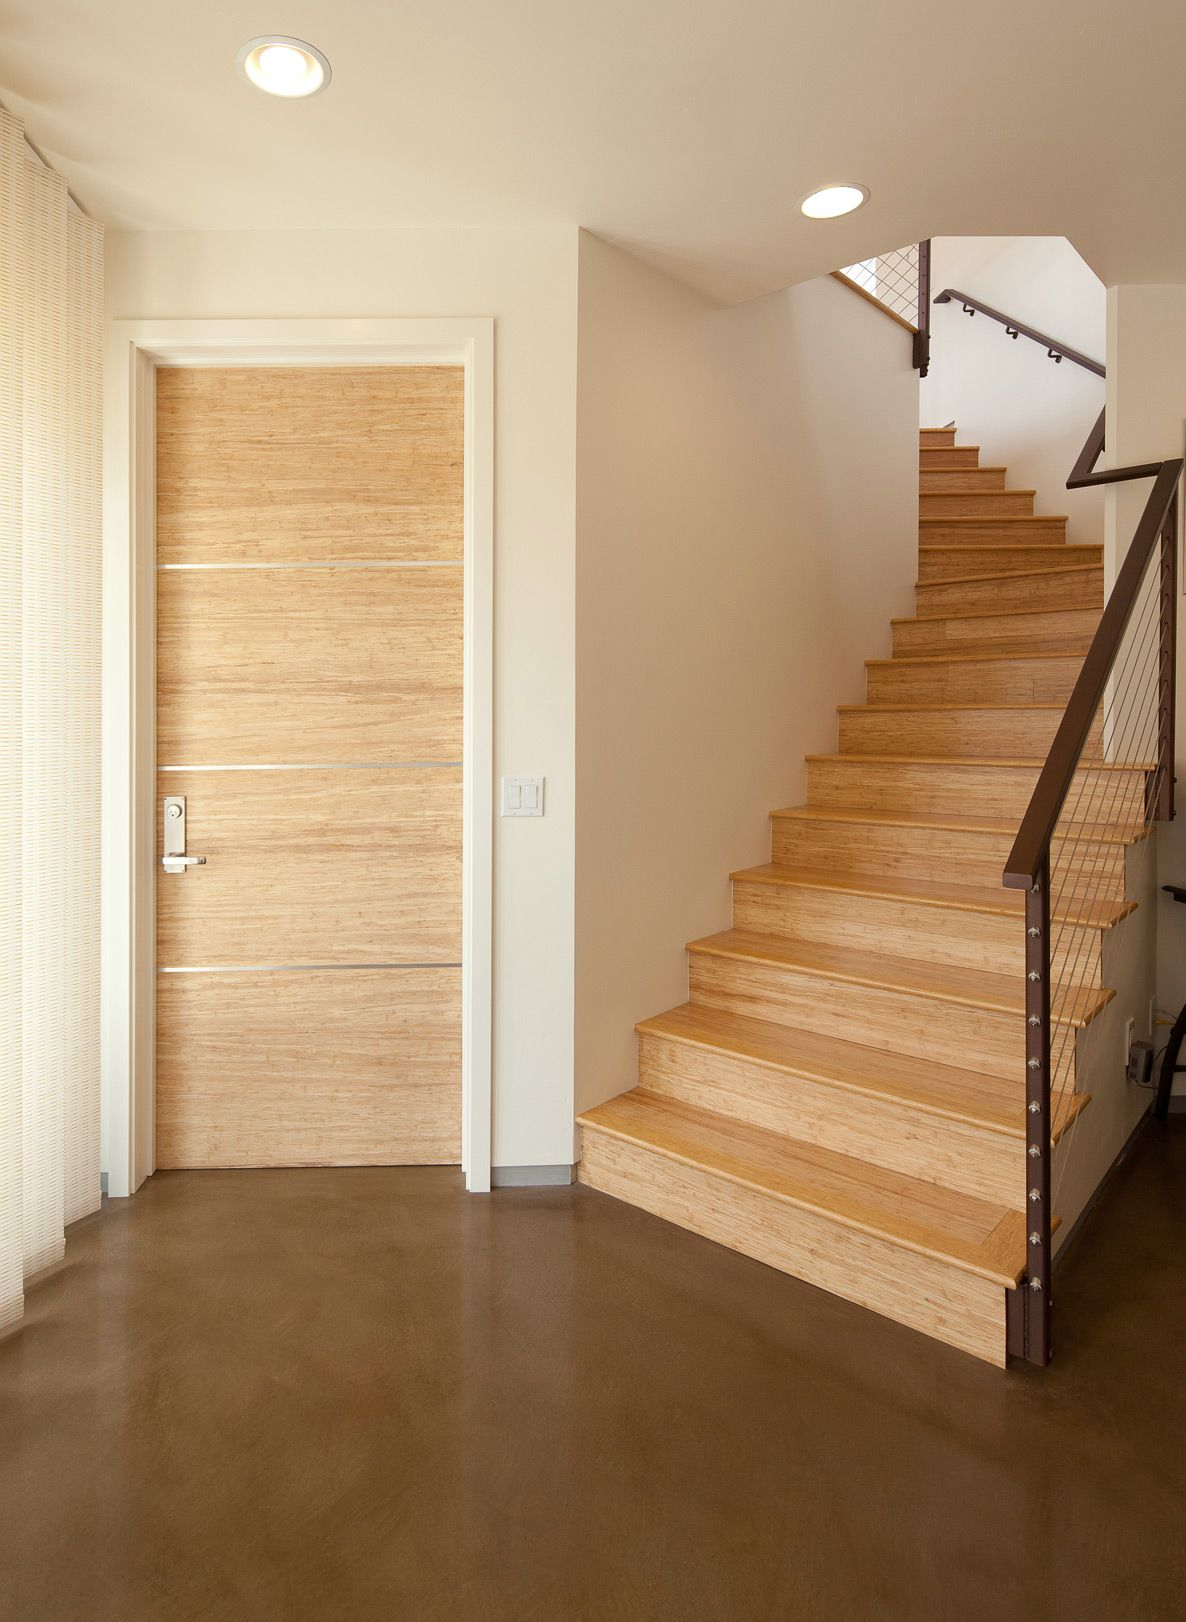 Bamboo Door Bamboo Stairs Dream House Pinterest Doors